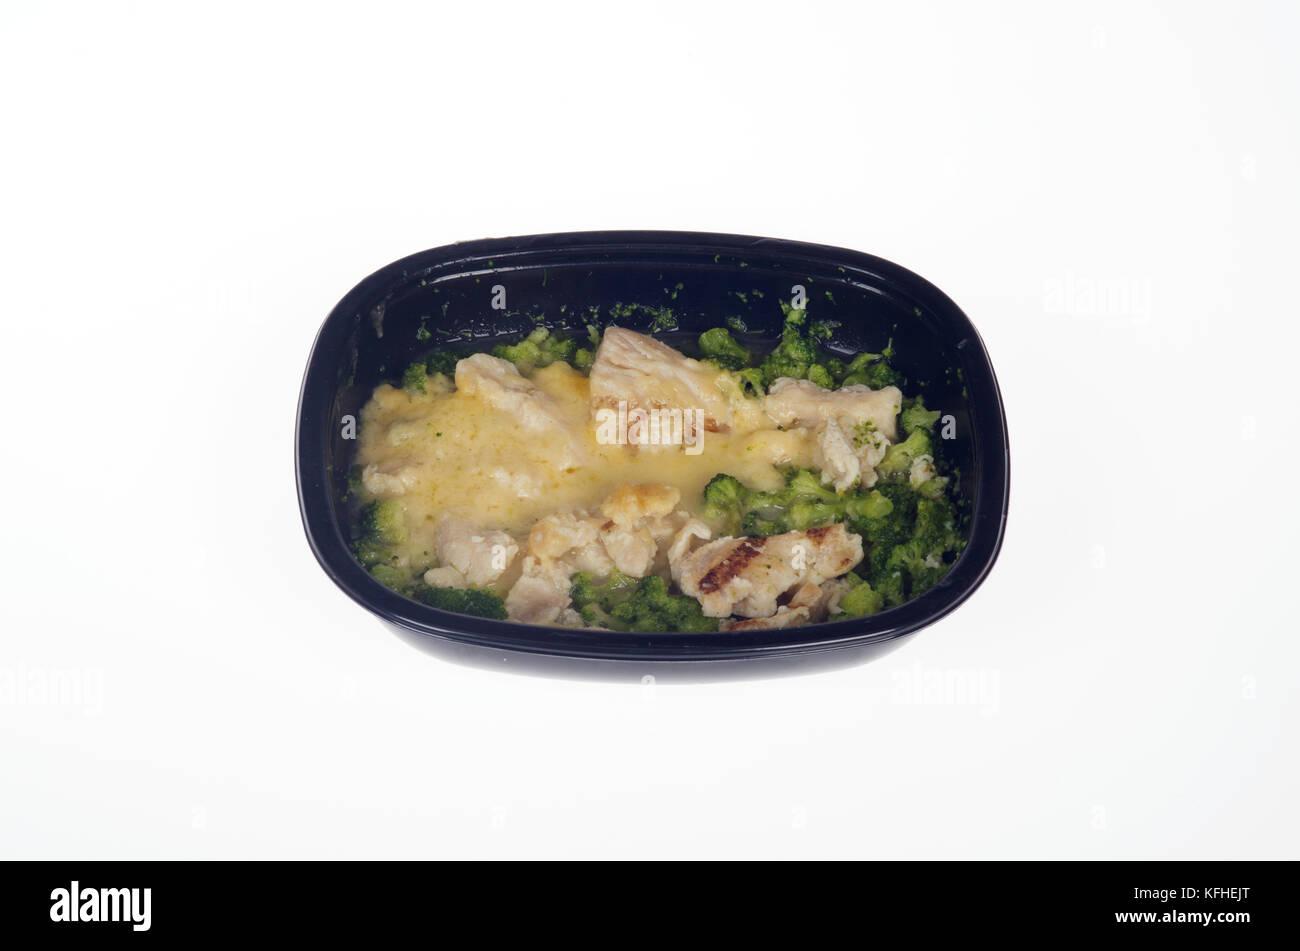 Microwaved Atkins Diet chicken tv dinner - Stock Image